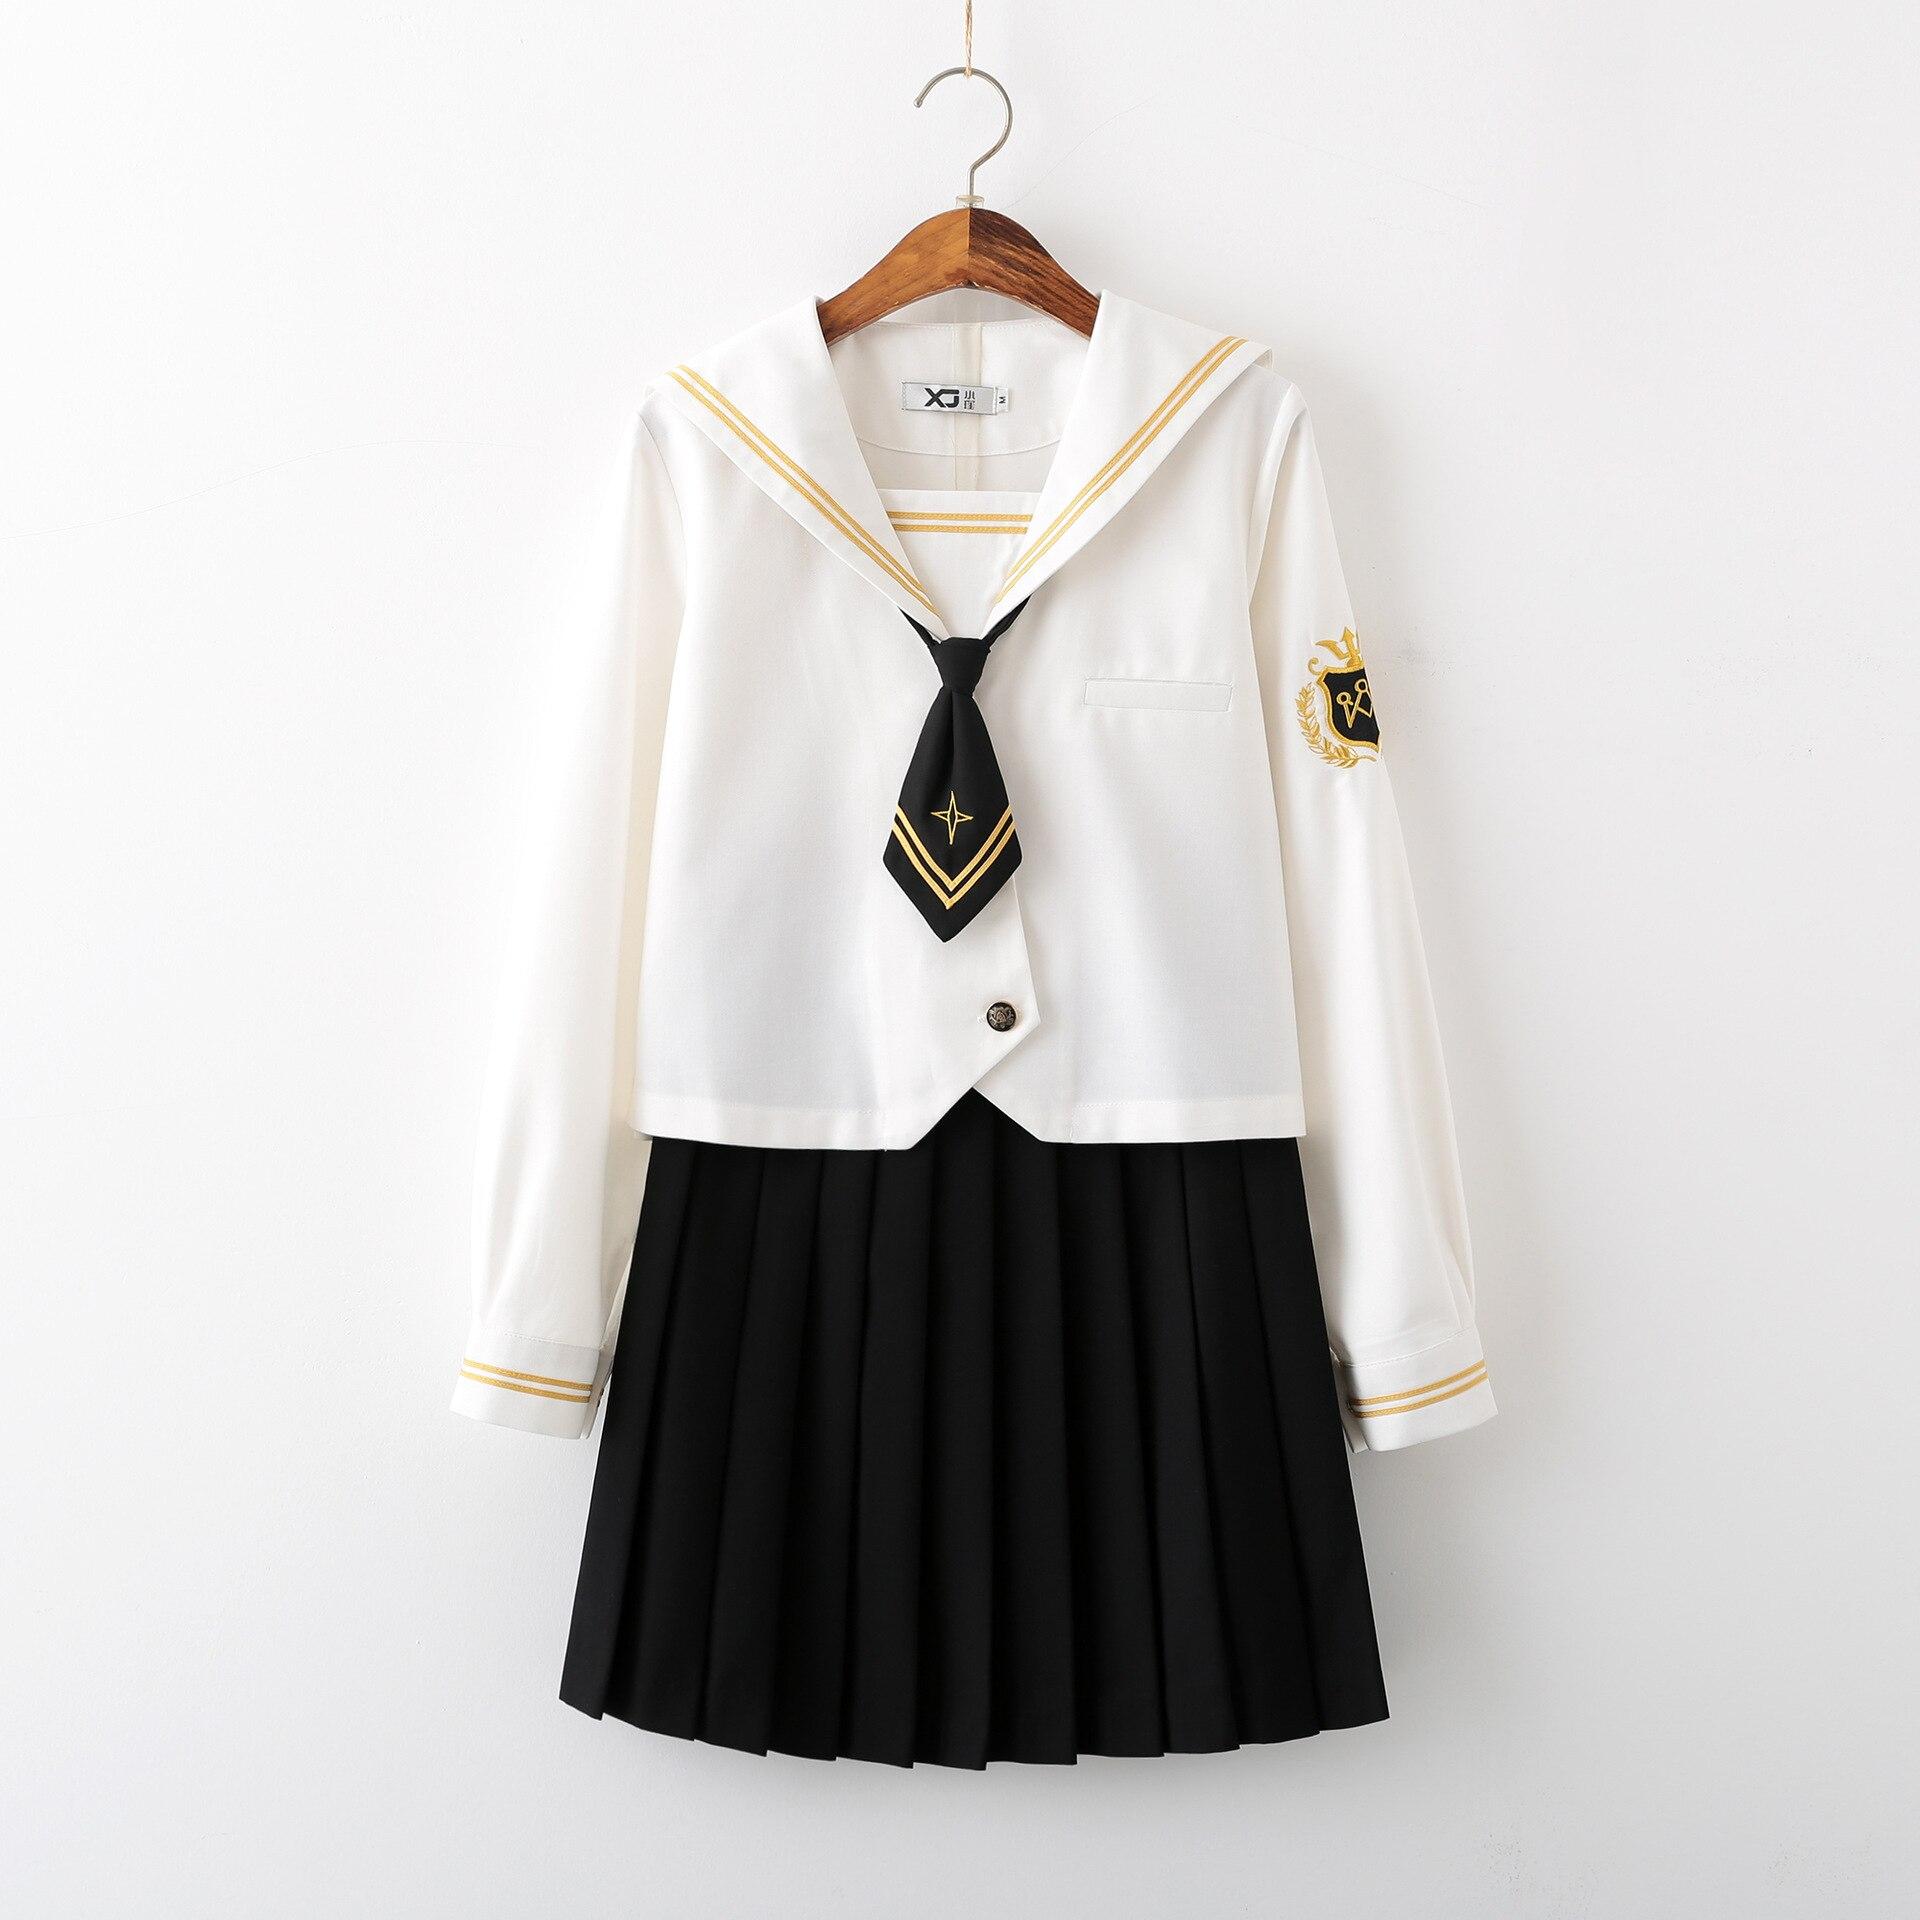 Japanese School Uniform Student Class Suit JK Uniforms Orthodox Sailor Dress Genuine School Girl Costume Corea Japonais Seifuku